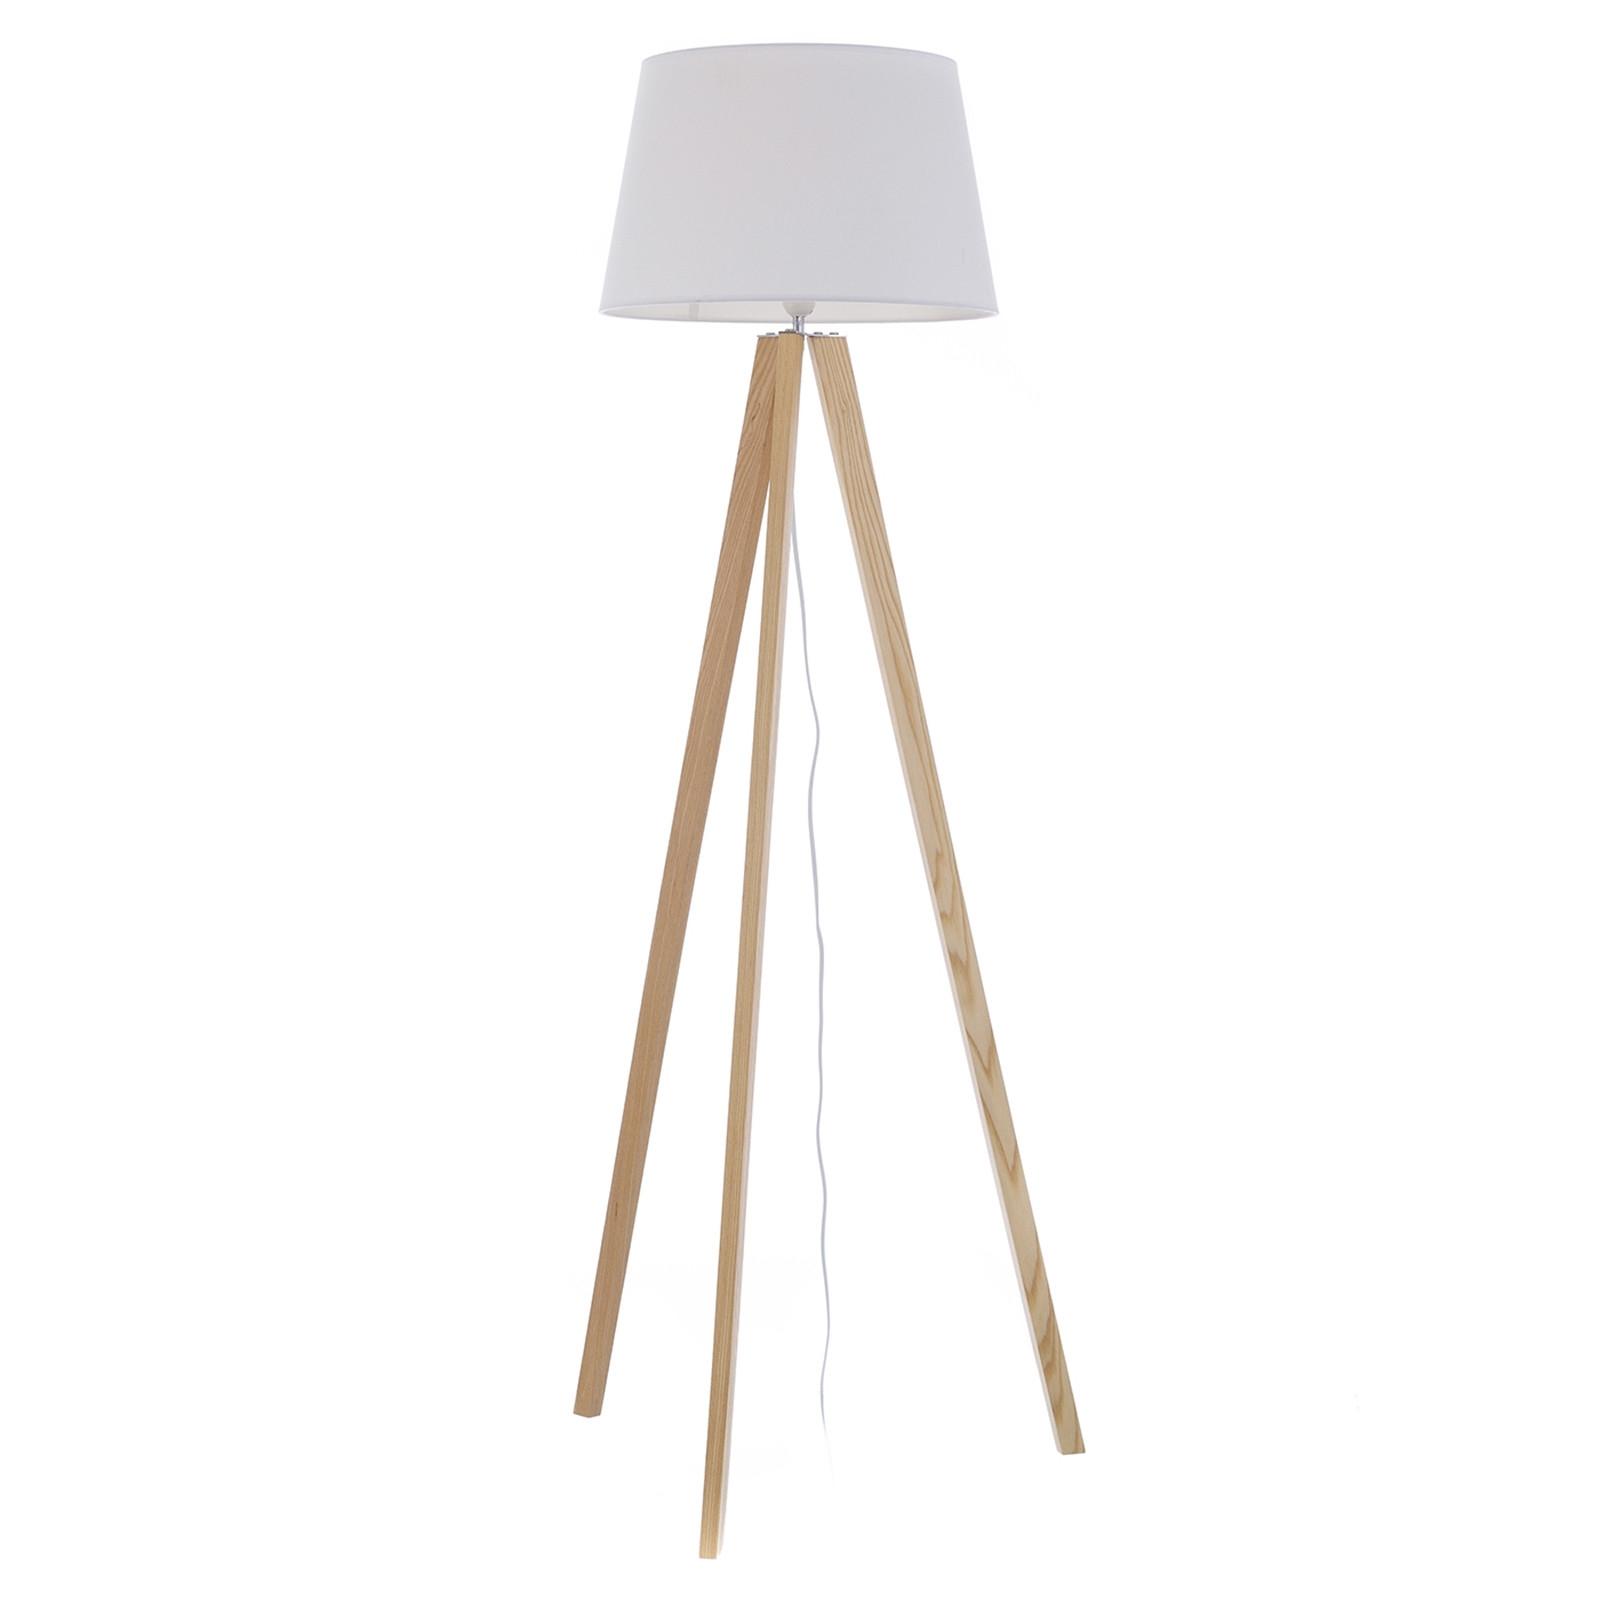 Lamparas de pie salon best lampara de pie pavine lampara - Lamparas de salon de pie ...